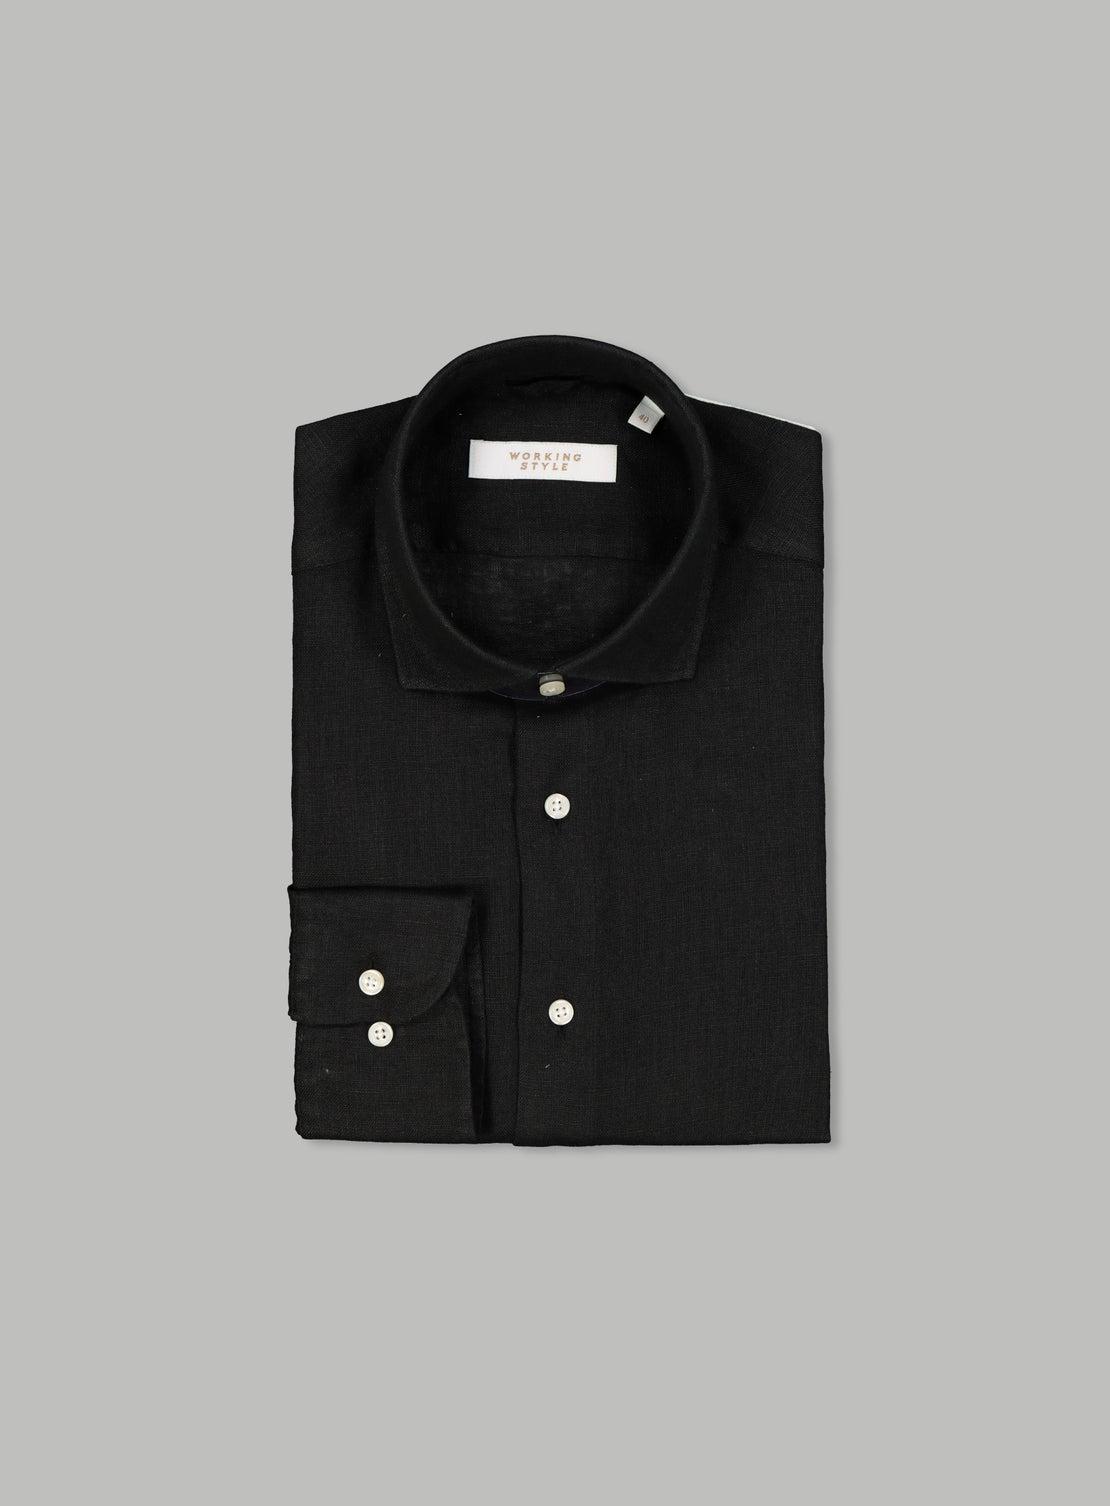 Umberto Black Linen Shirt